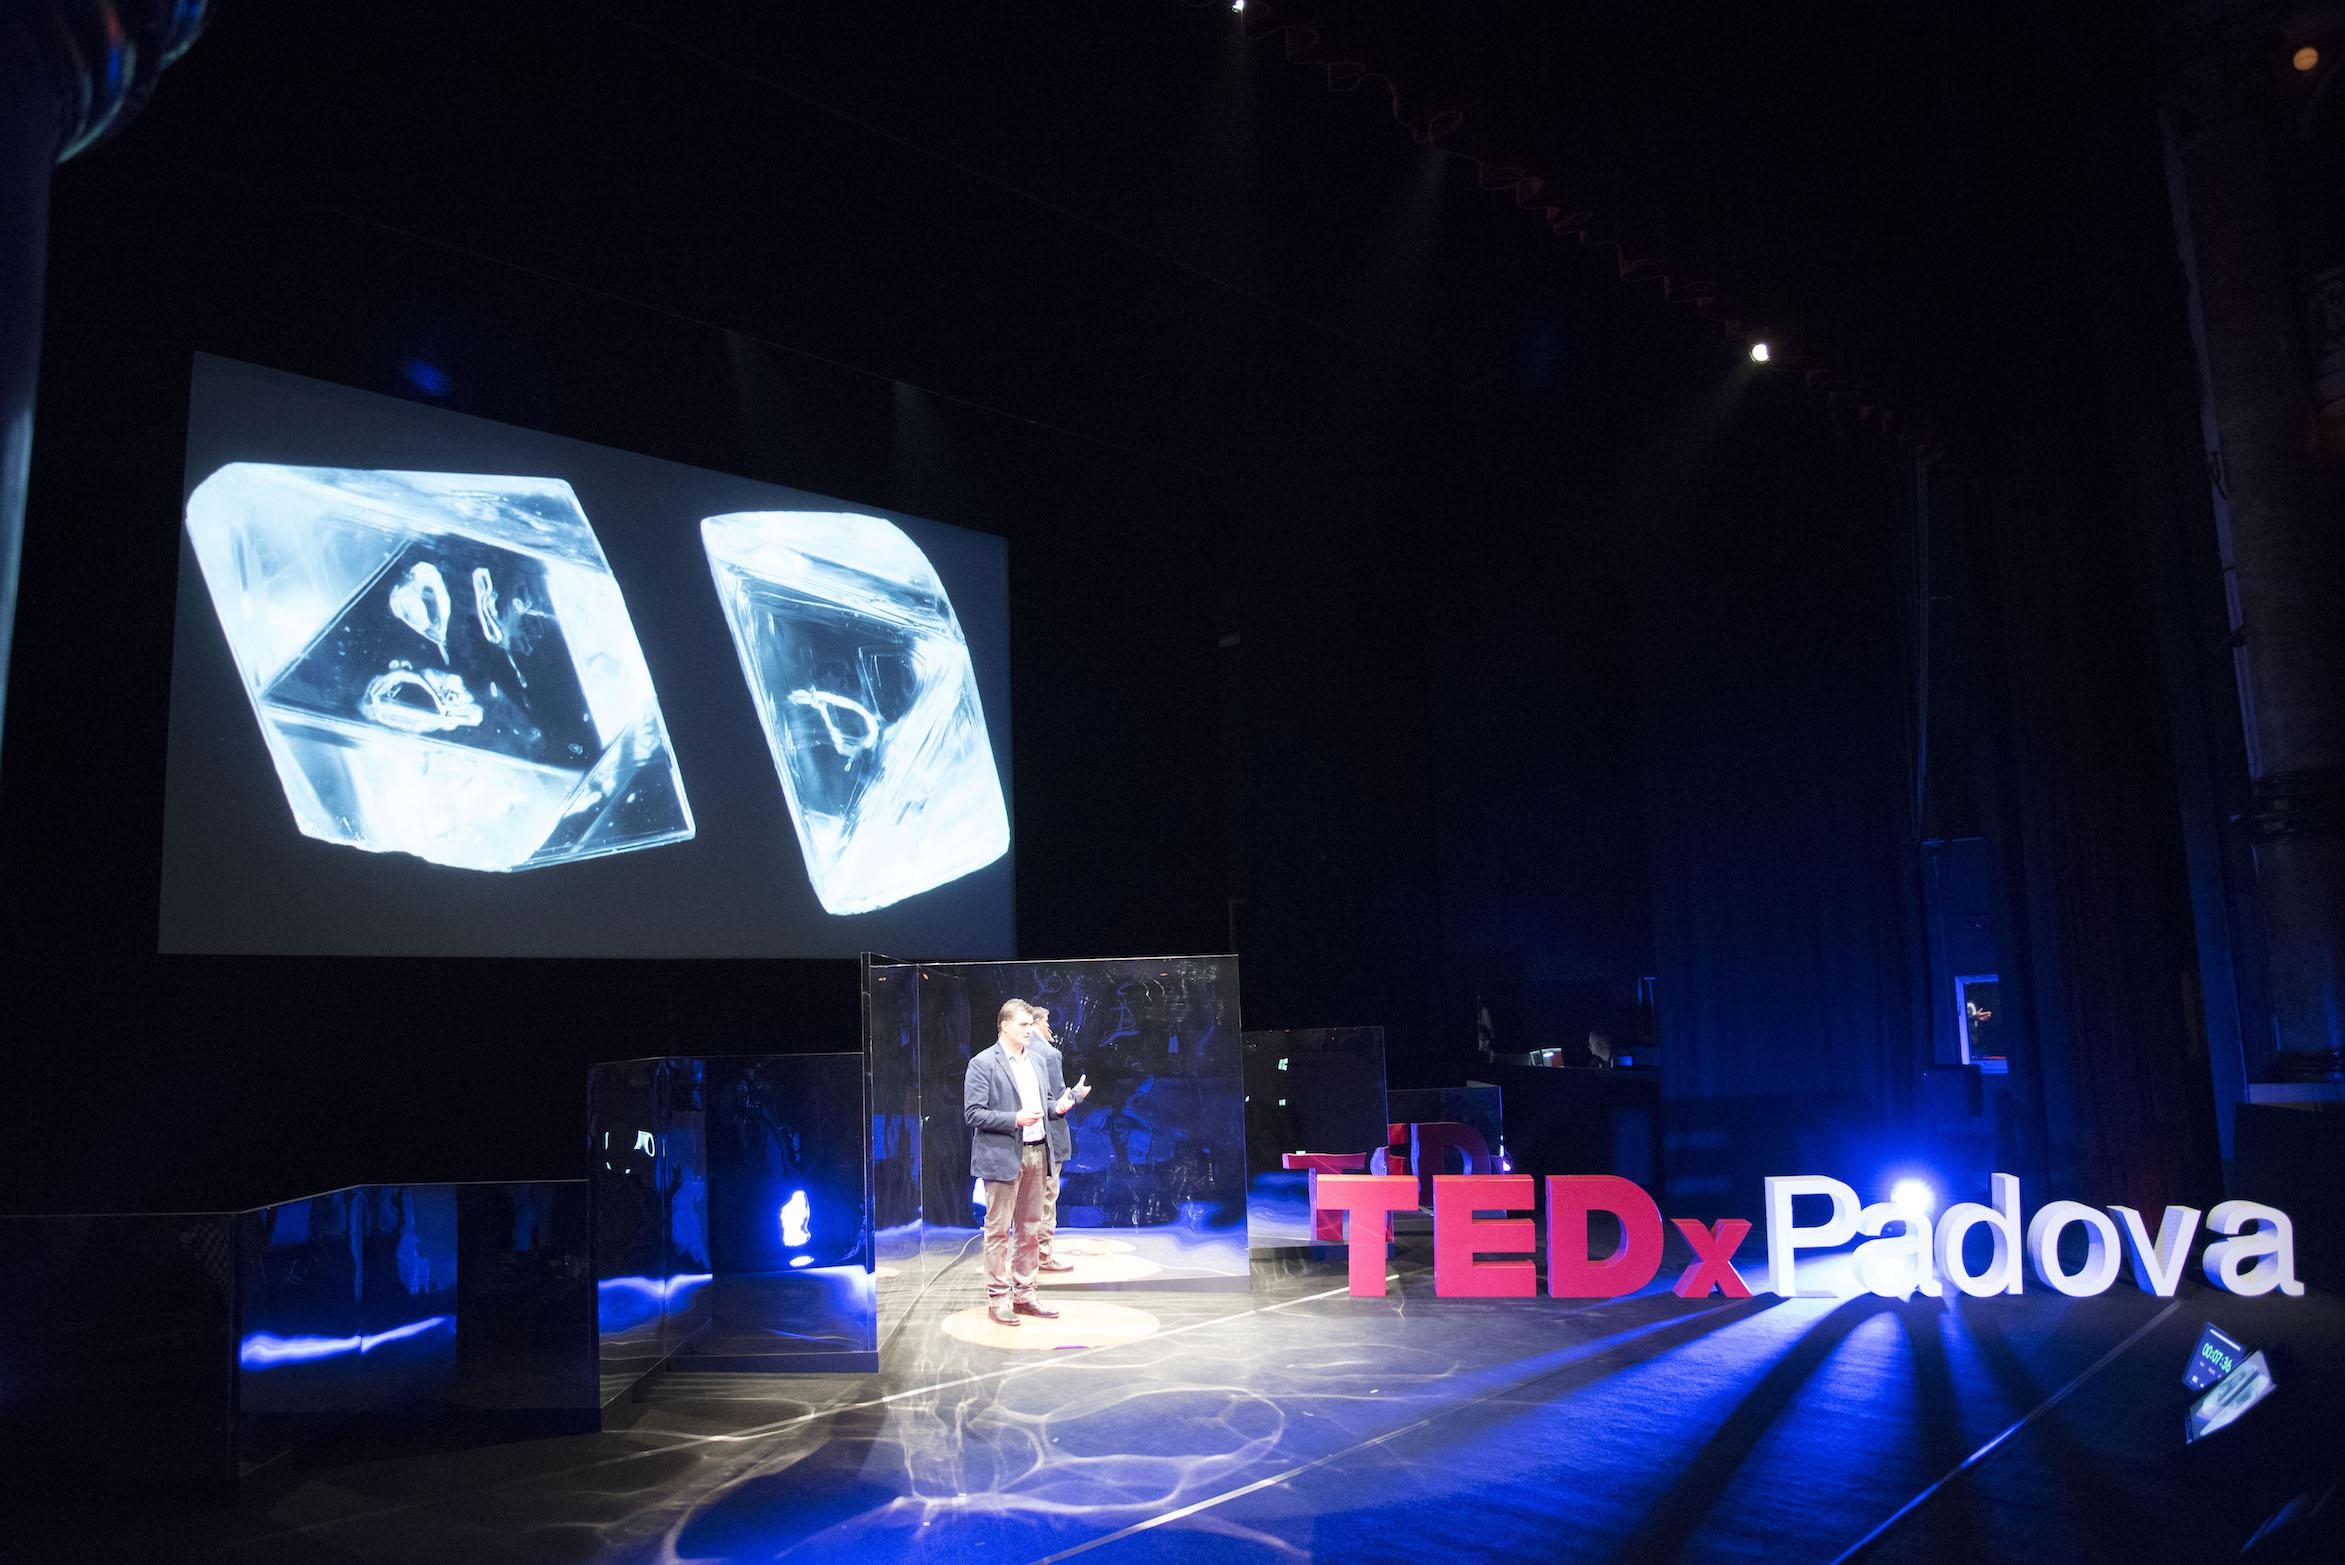 TEDxPadova